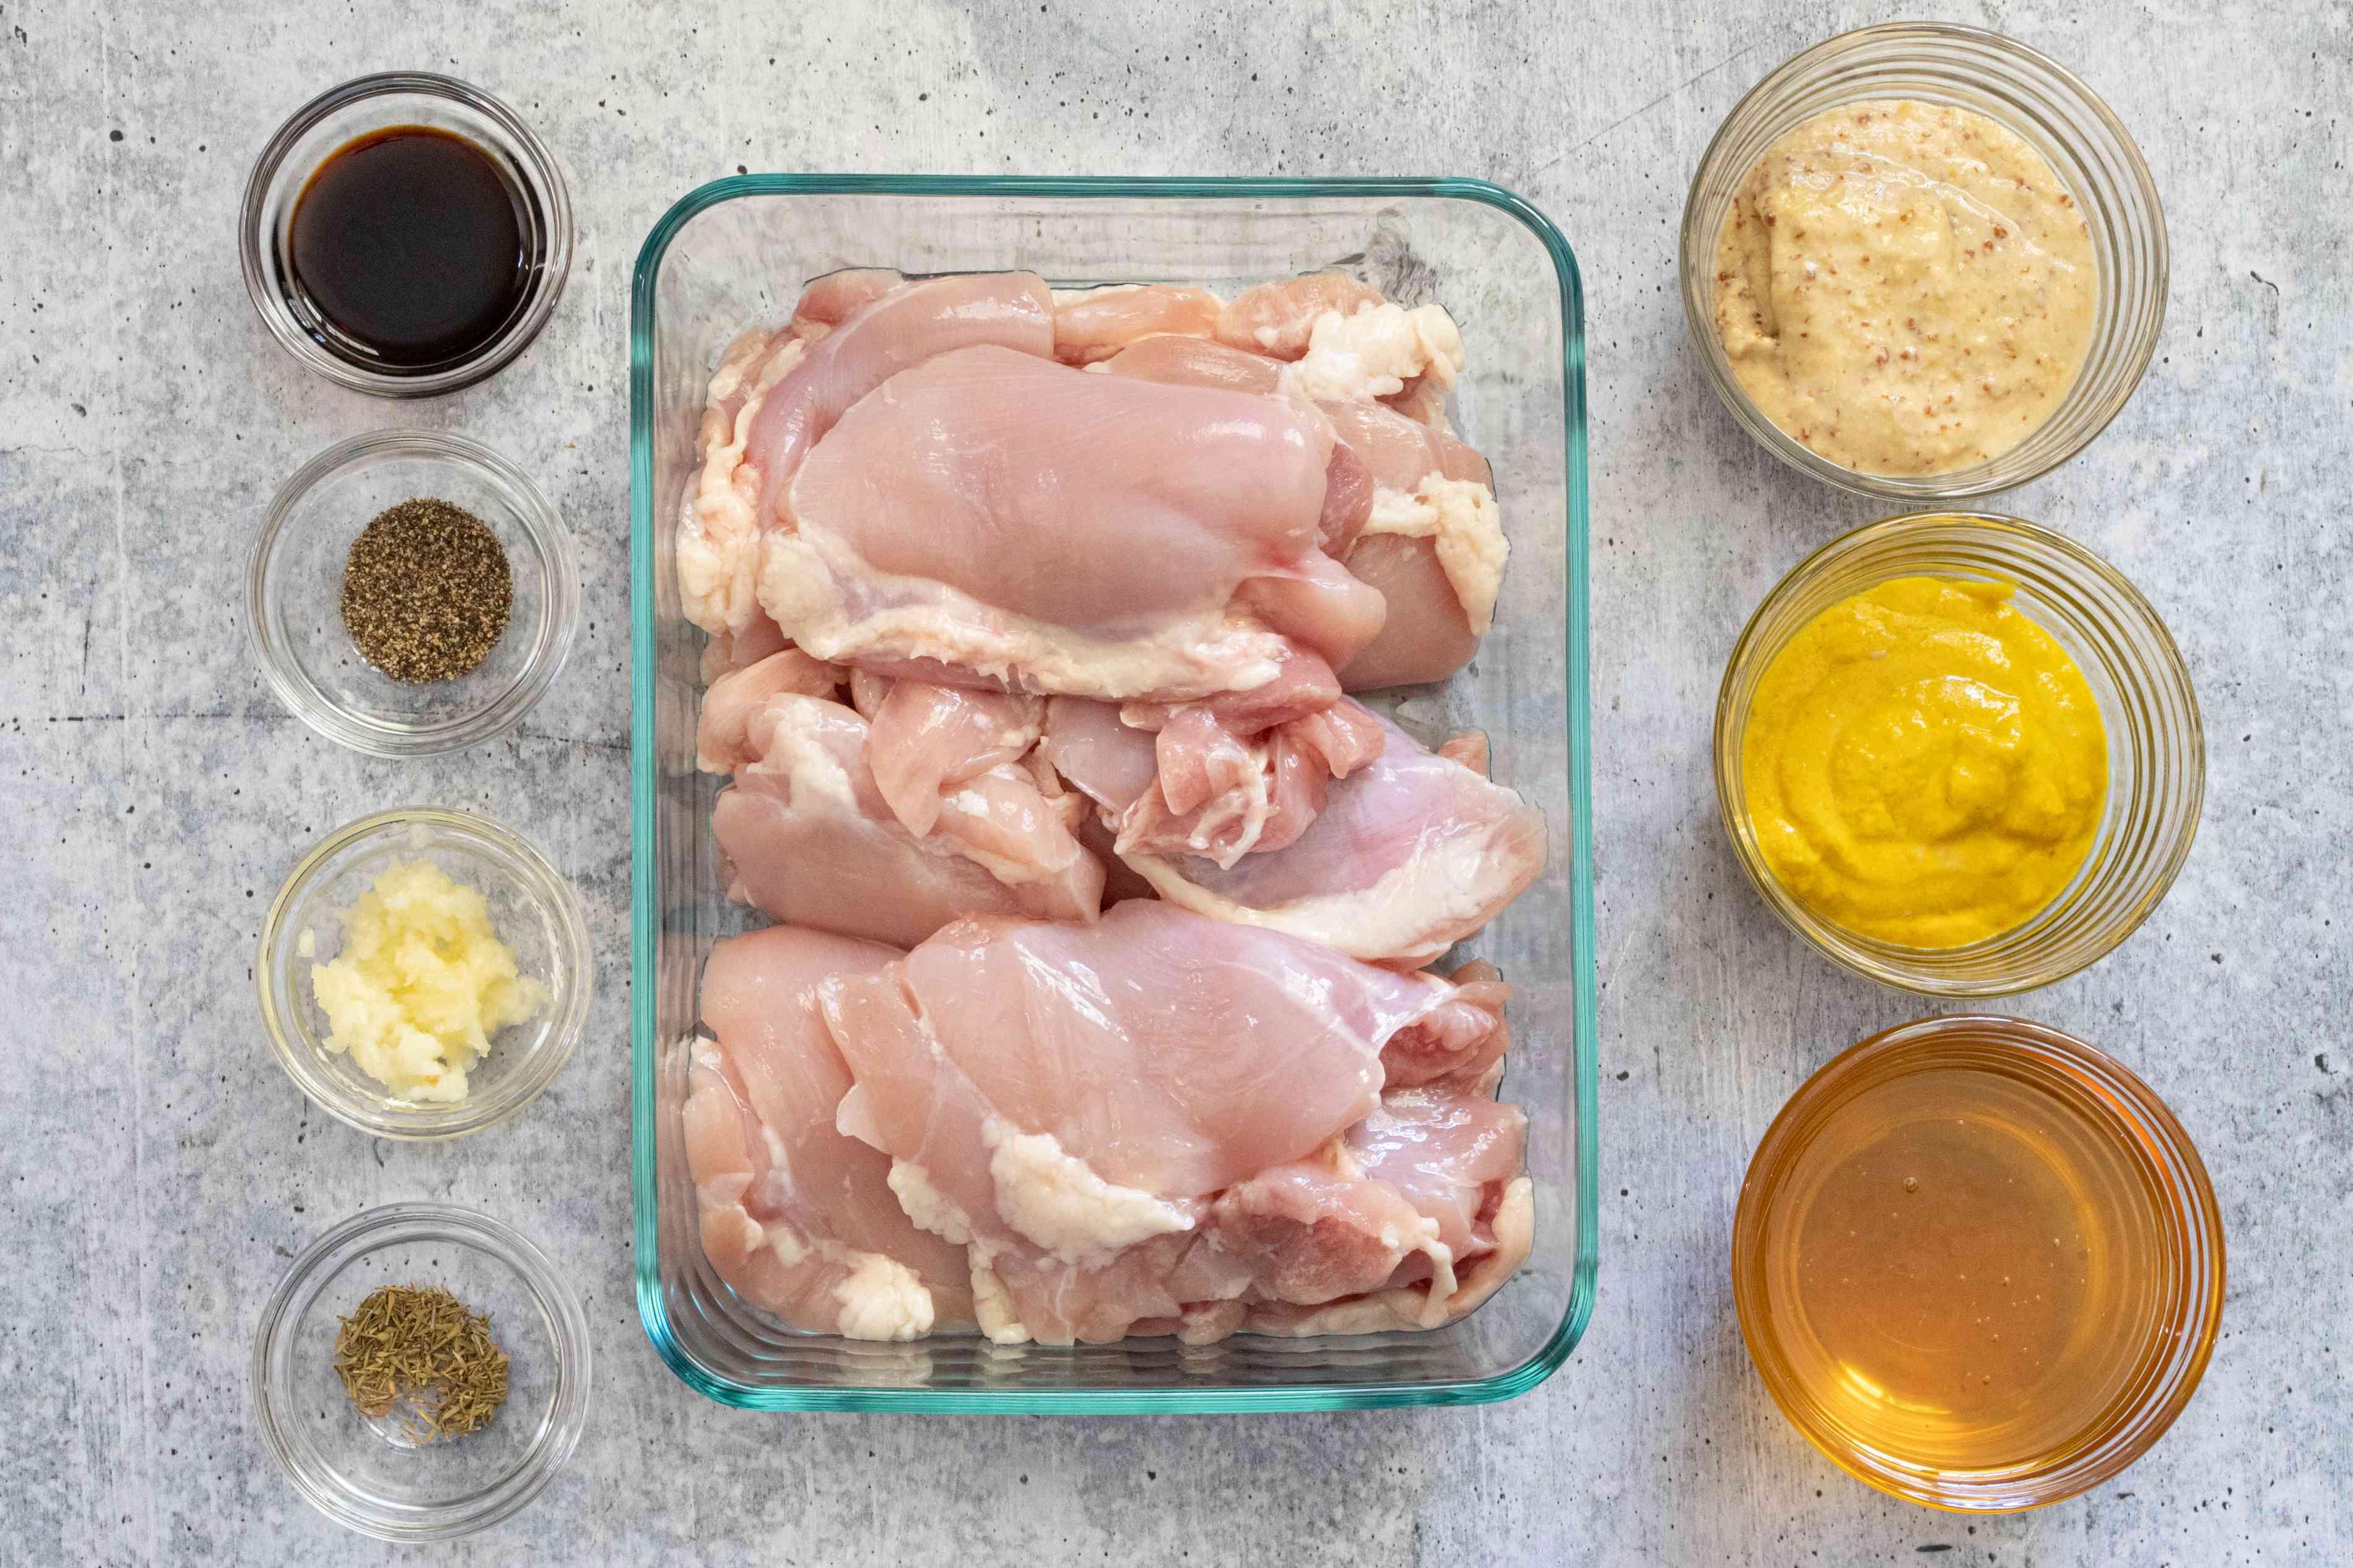 ingredients for slow cooker honey mustard chicken